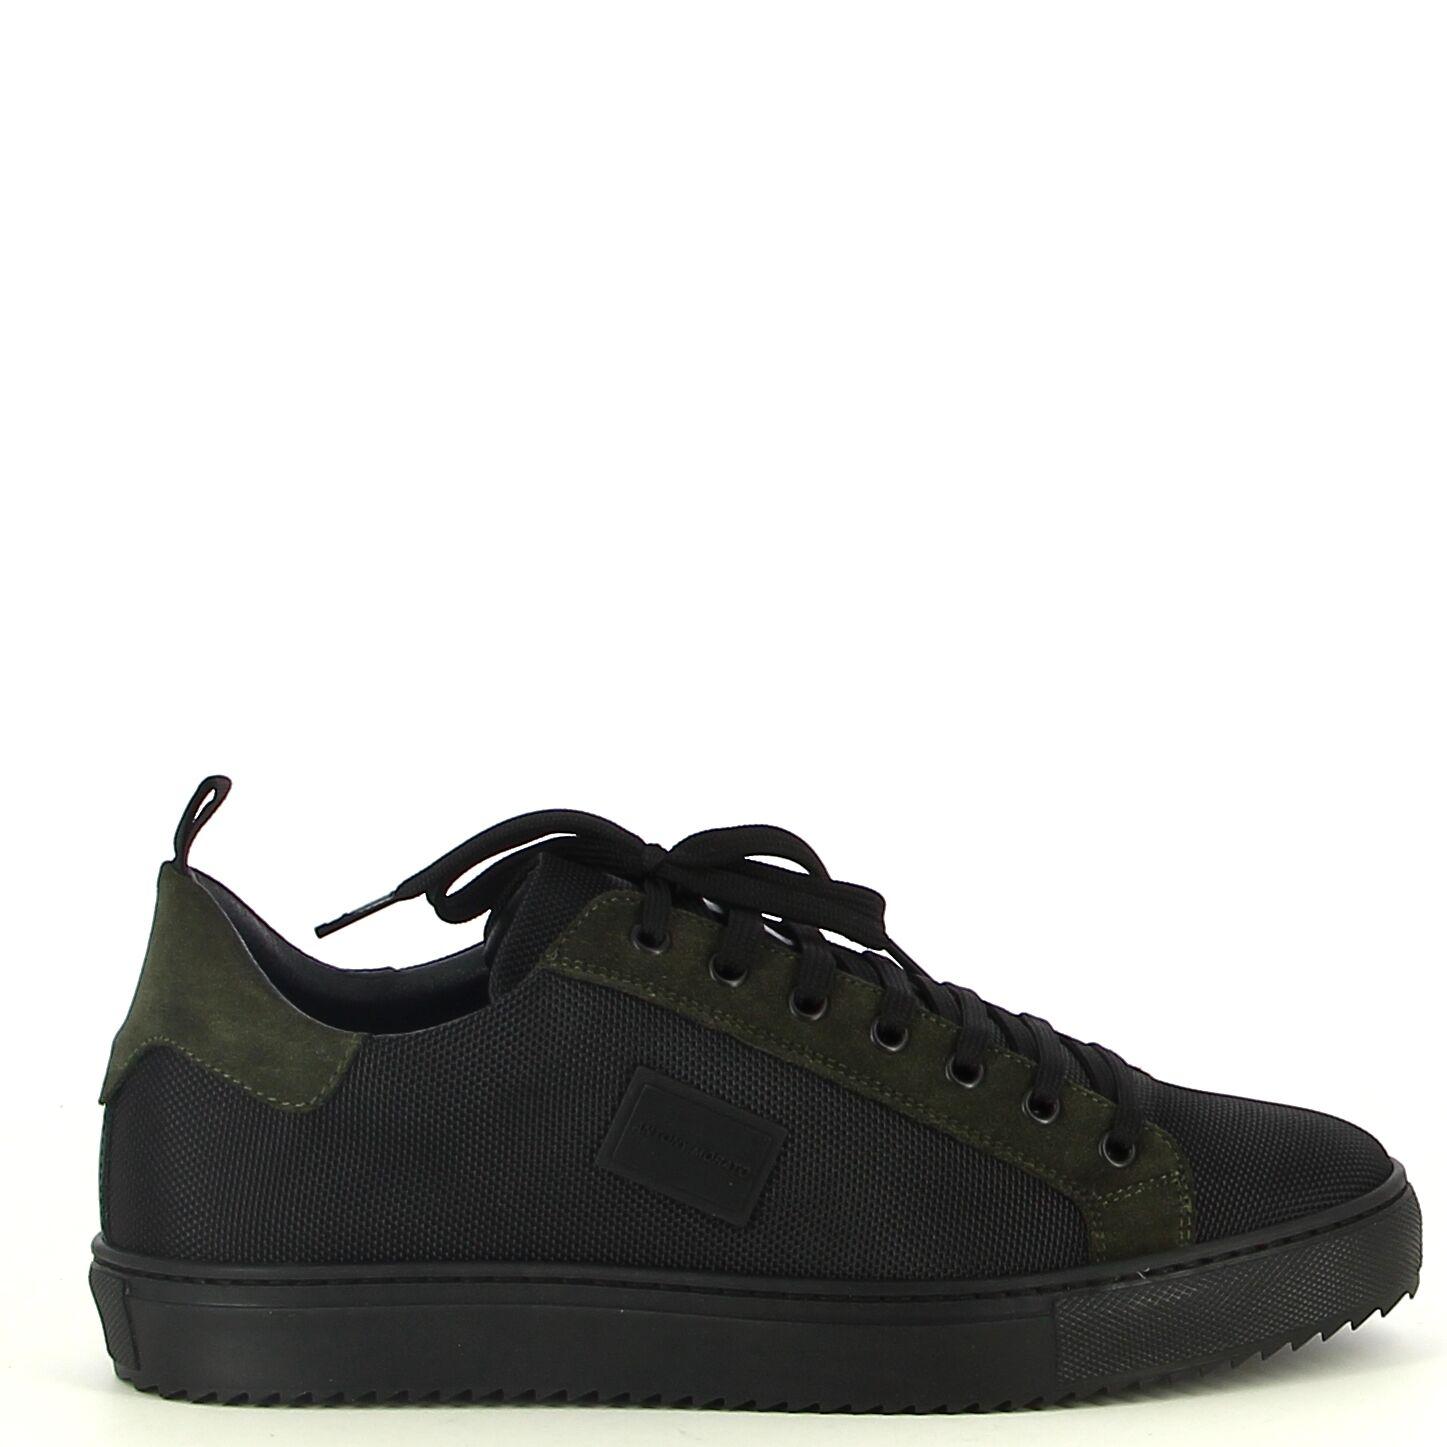 Antony Morato - Zwart - Sneakers